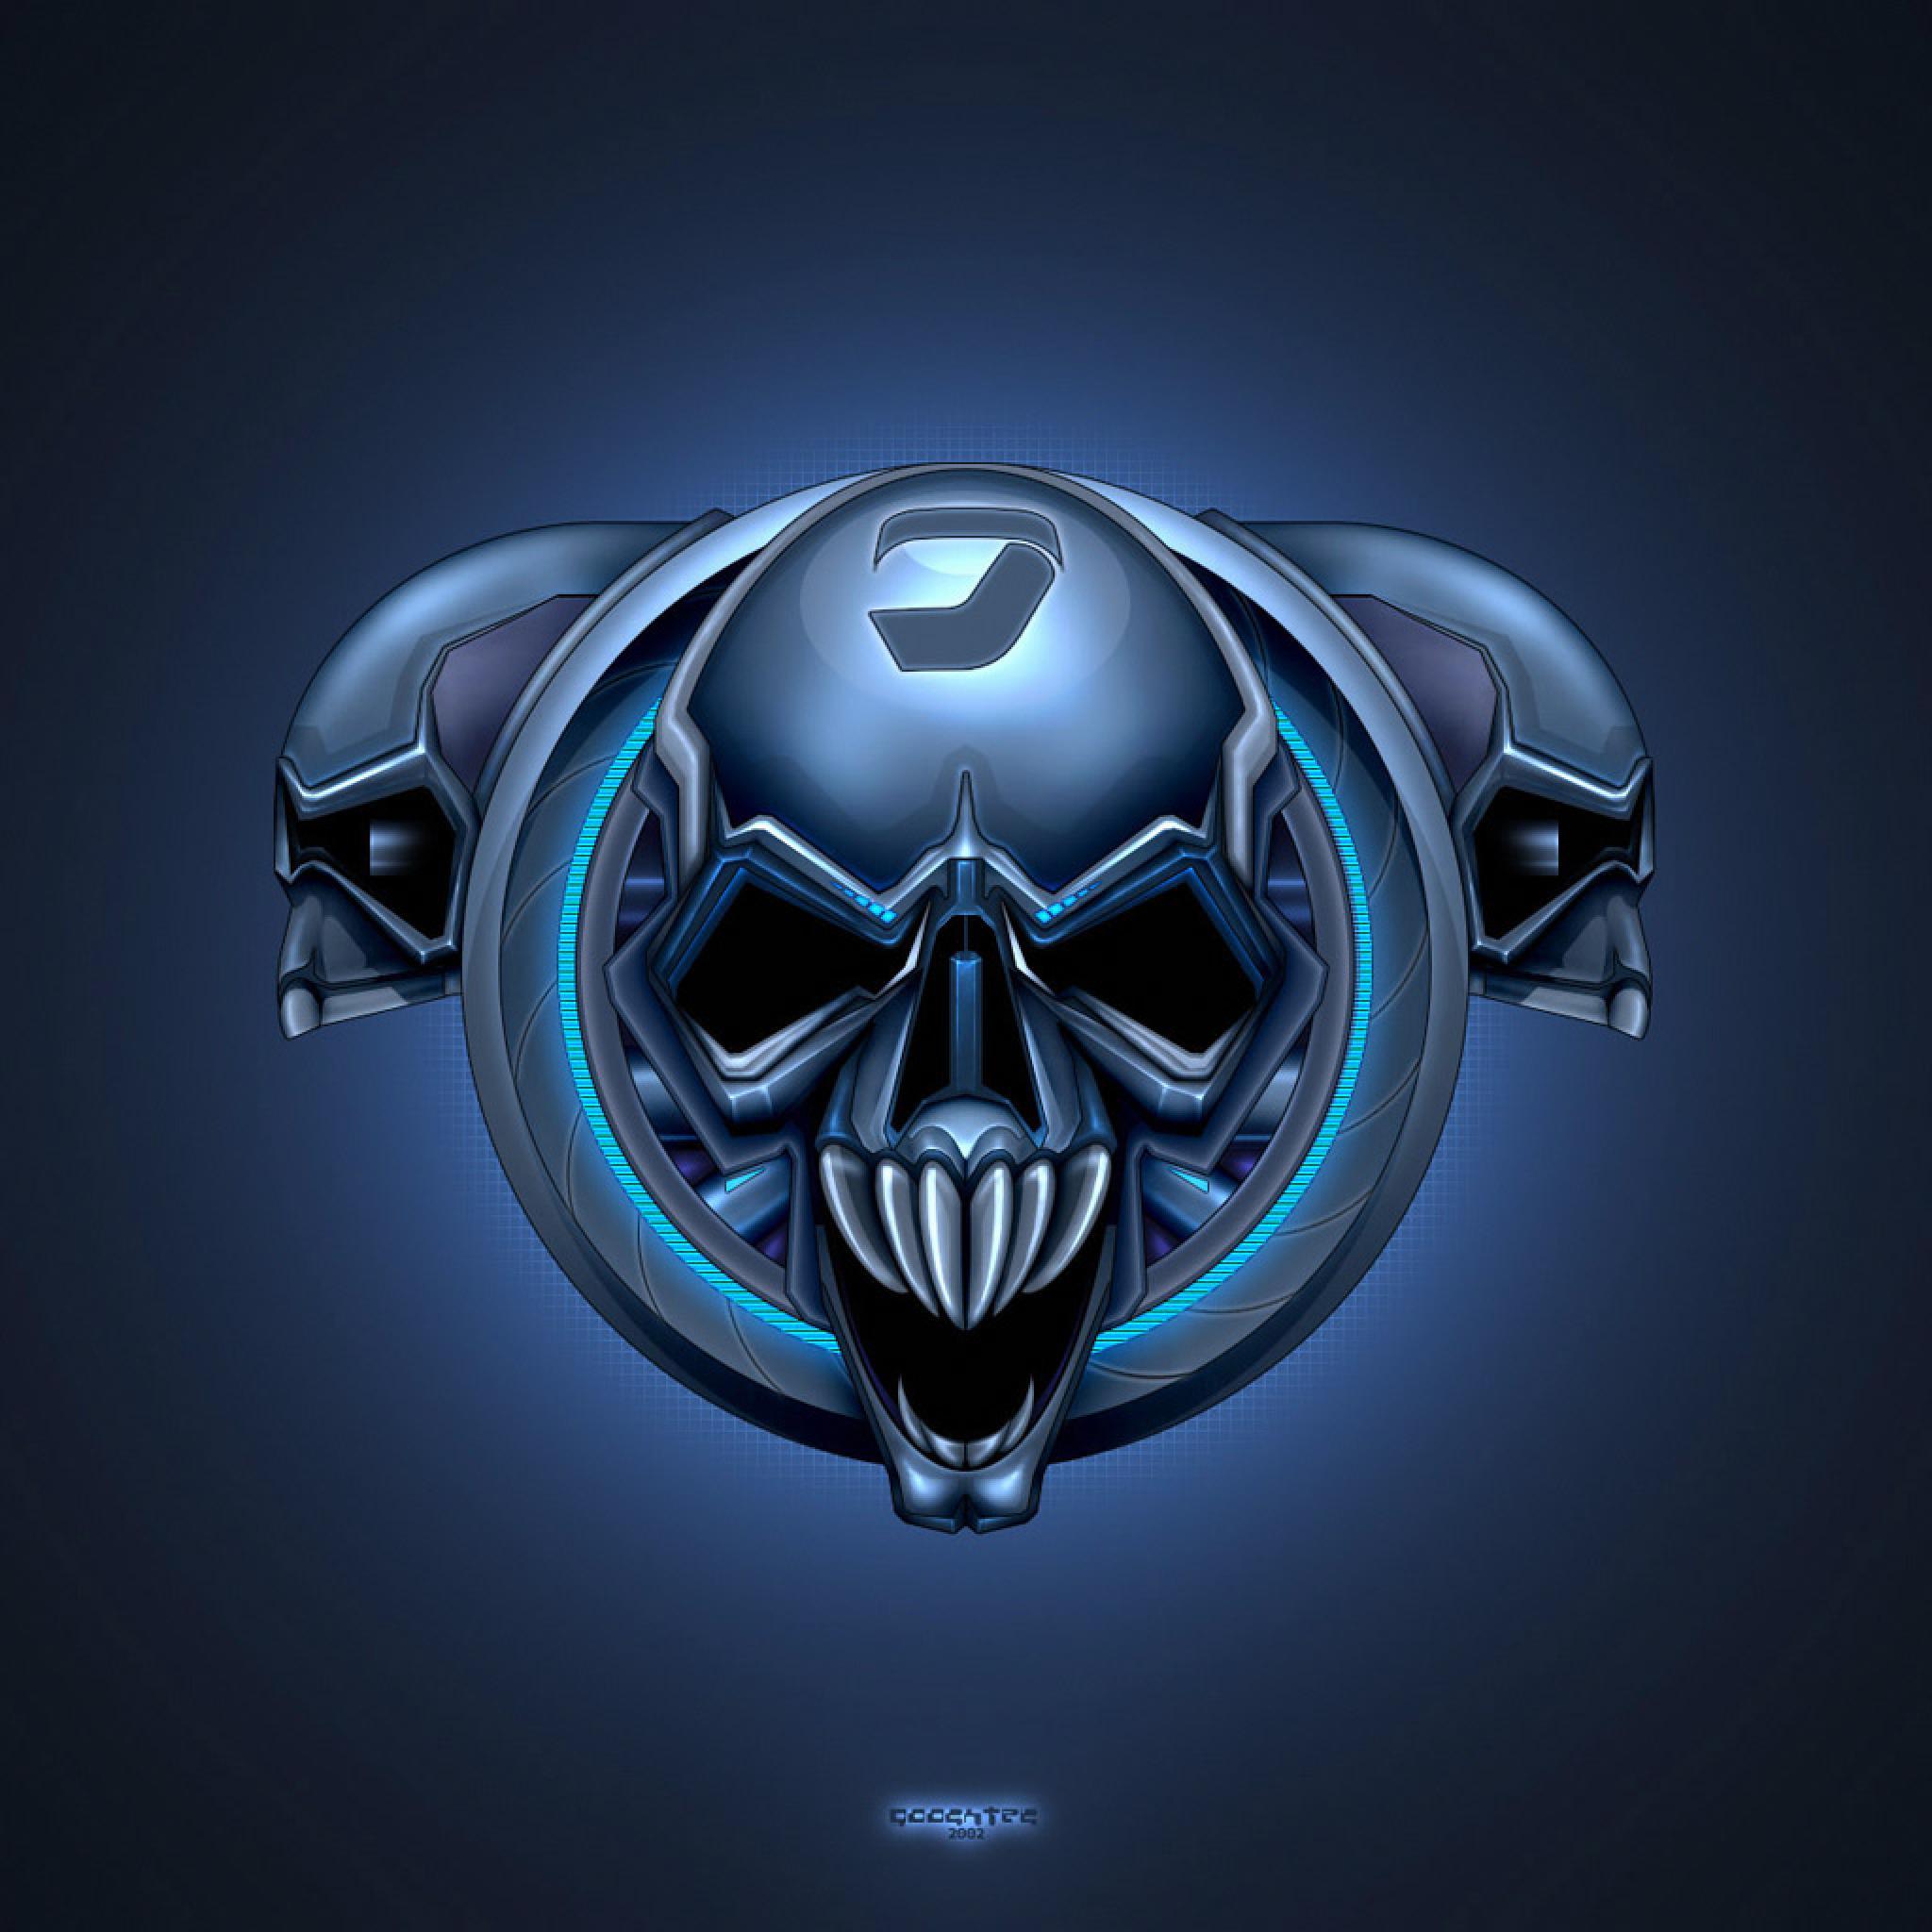 Skullcandy Iphone Wallpaper 3d Abstract Brainwash Skull 3d Ipad Iphone Hd